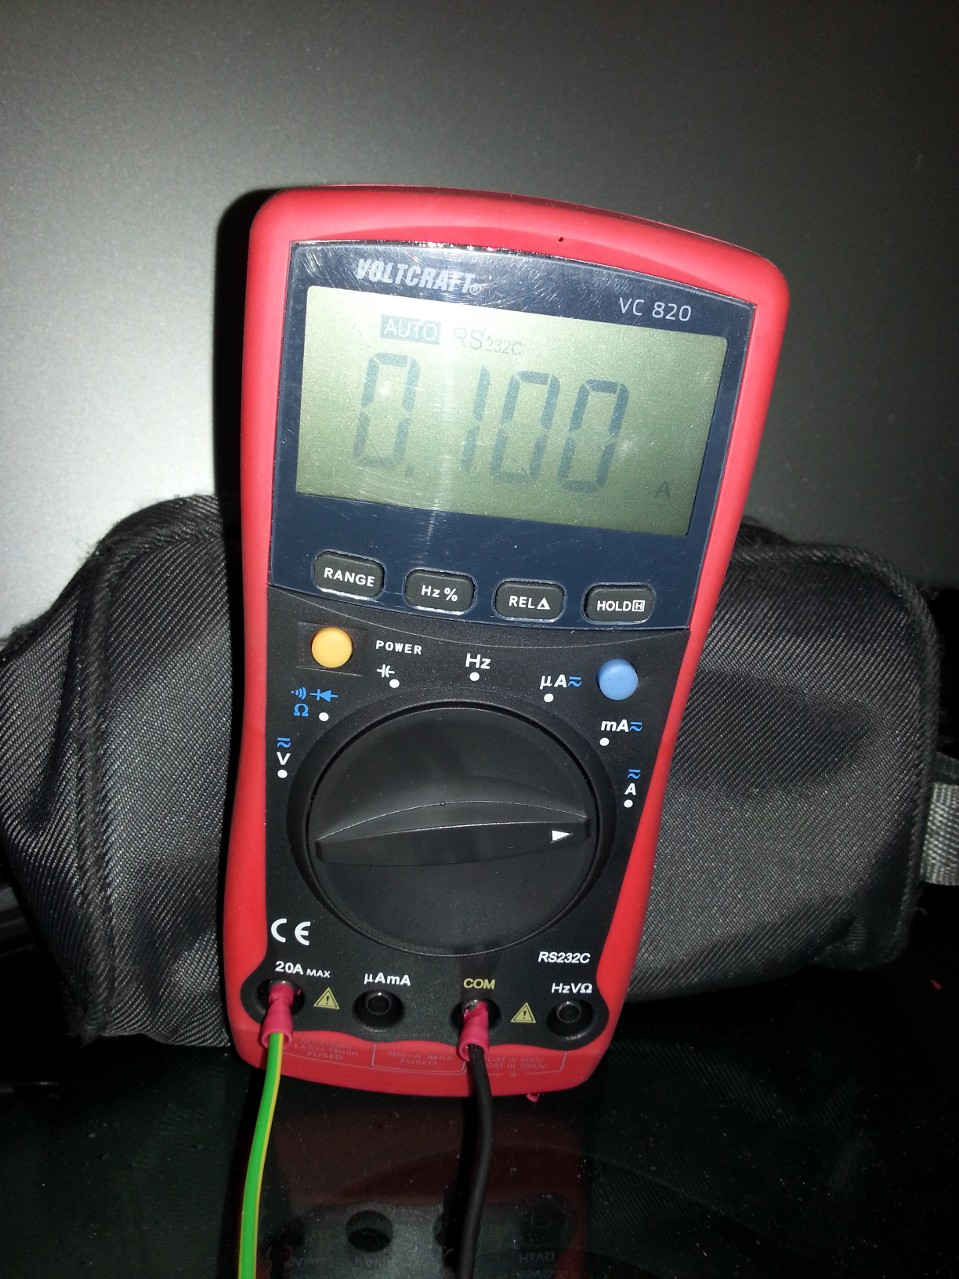 C3 pulled 123ma cu alarm system central locking power window d1 pulled 103ma power window d8 pulled ended at 100ma radiator fan 2